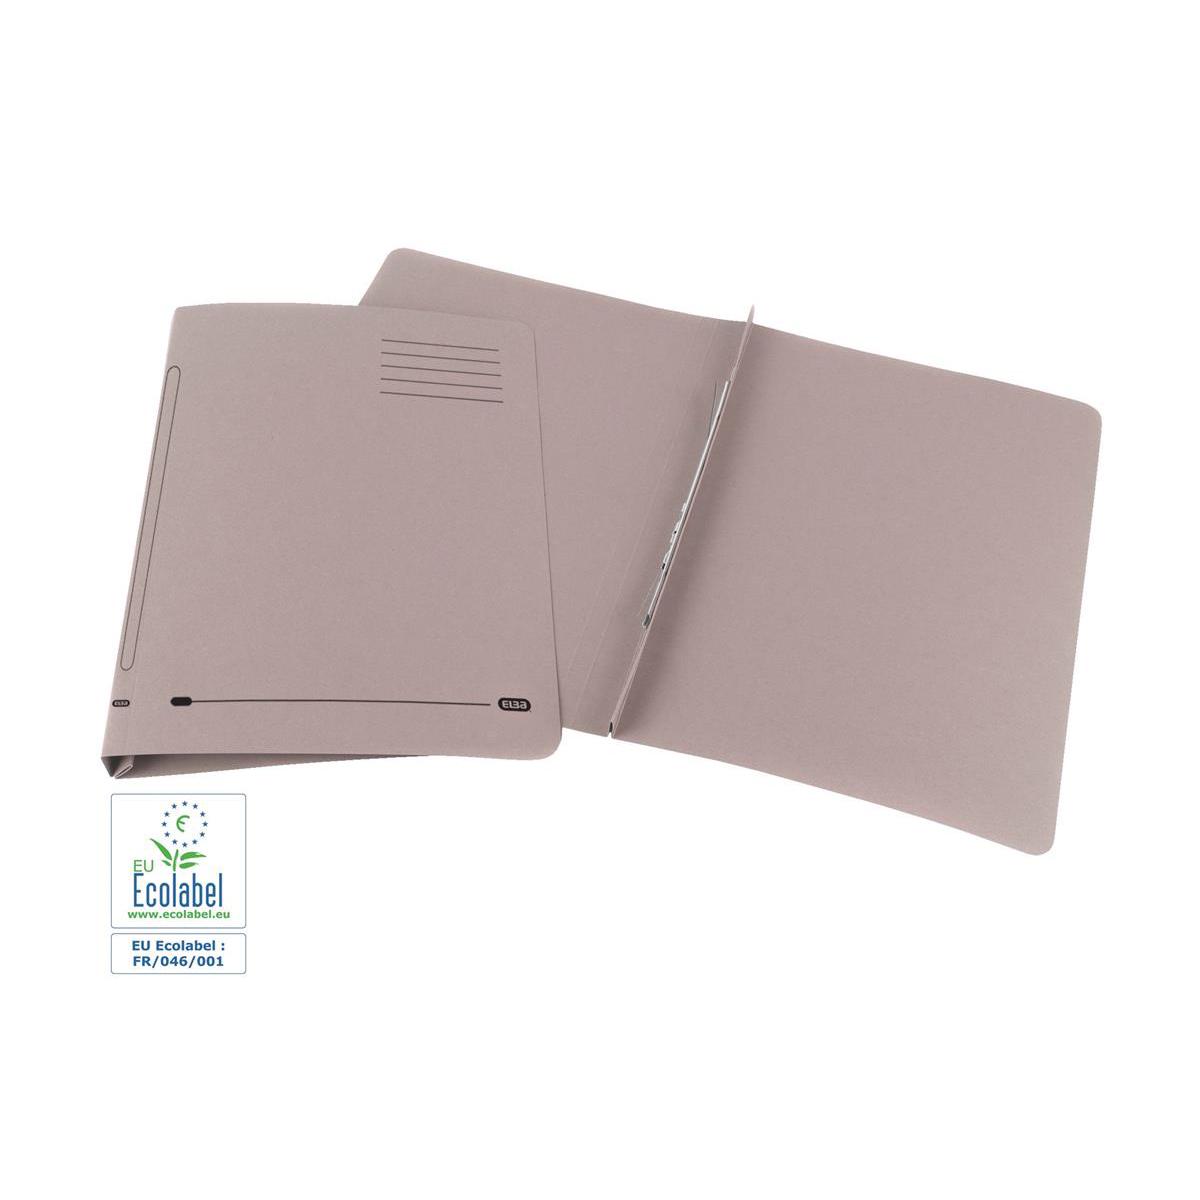 Elba Ashley Flat Bar File (no pocket) 285gsm Capacity 35mm Foolscap Buff Ref 100090153 Pack 25